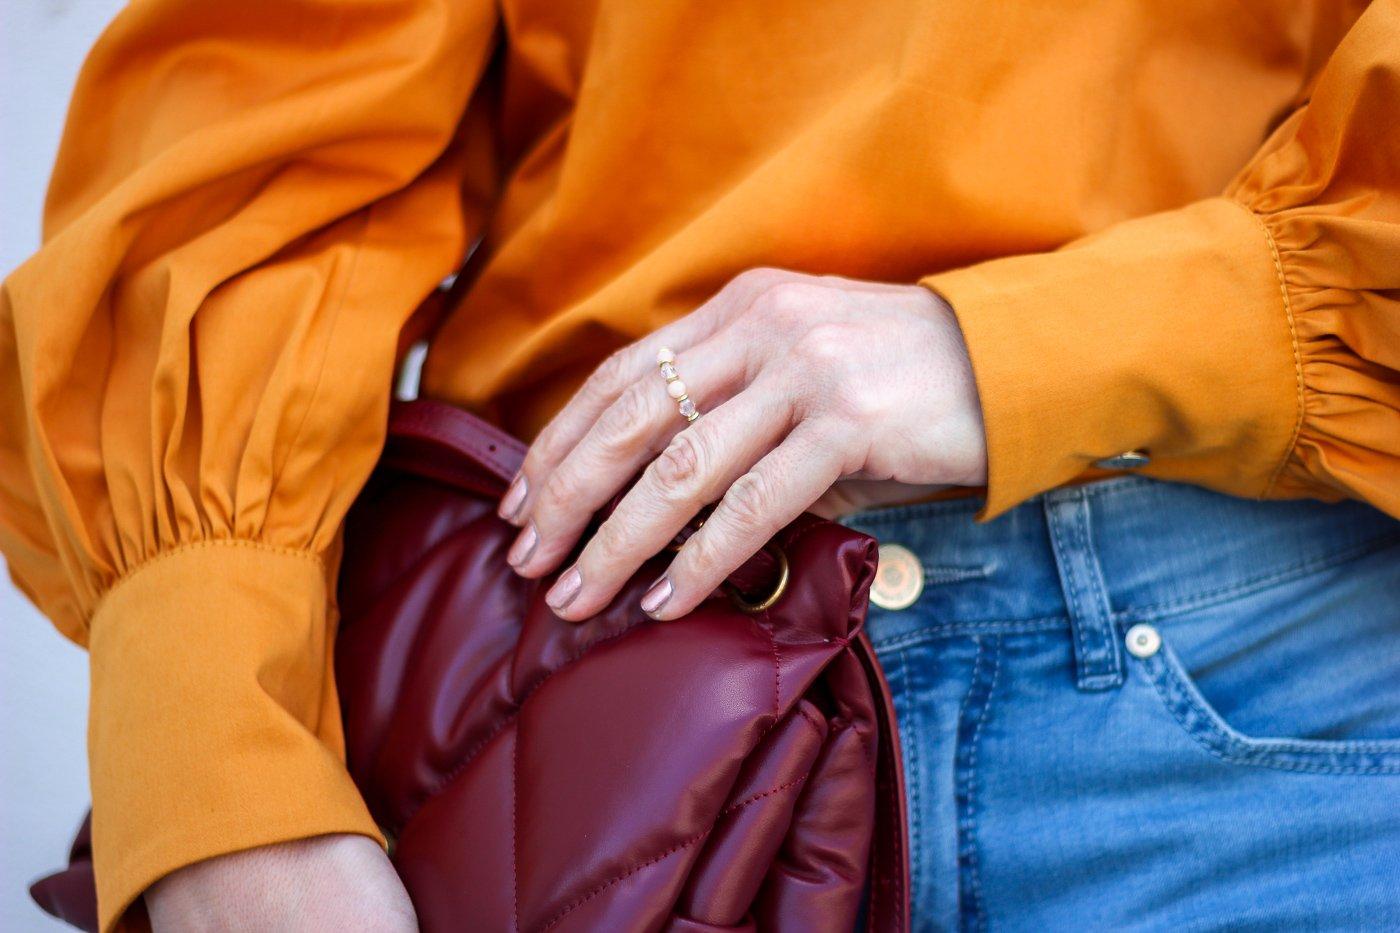 conny doll lifestyle: Details, orange Bluse, rote Tasche, Balenciaga, Ring von OHCaroJewelry